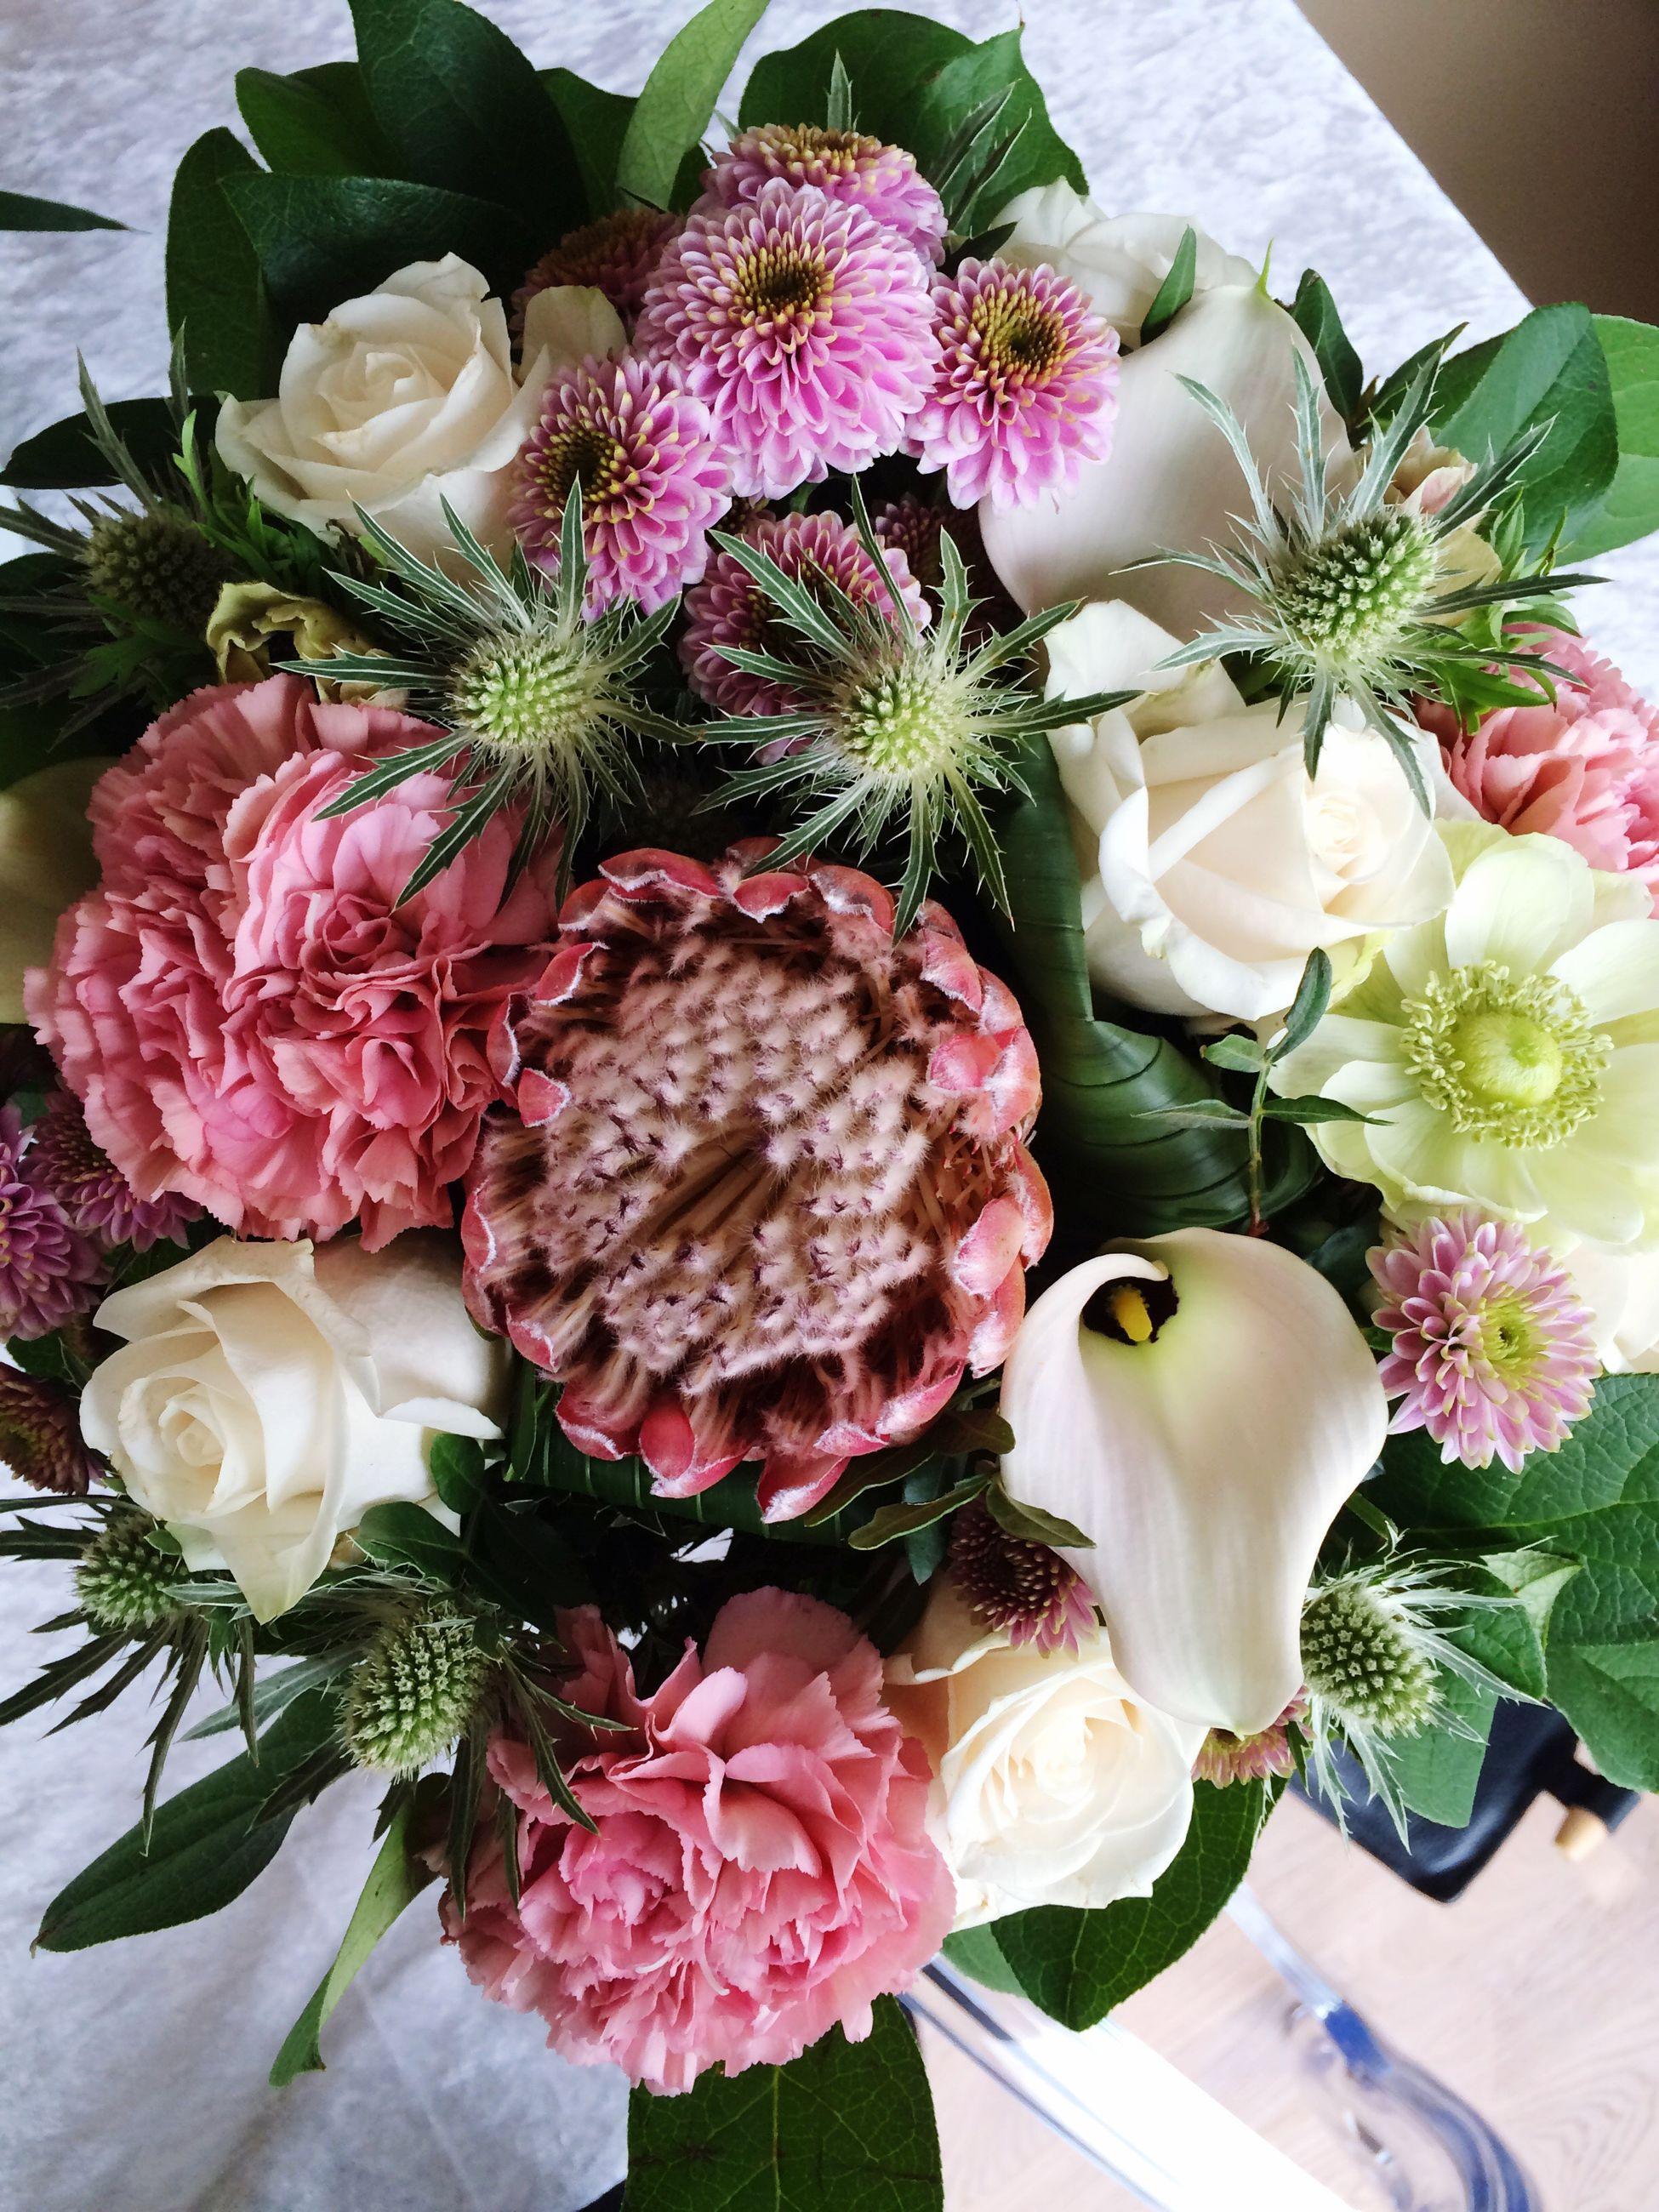 flower, indoors, freshness, still life, decoration, vase, petal, table, bouquet, fragility, bunch of flowers, flower arrangement, close-up, pink color, high angle view, variation, rose - flower, food and drink, food, flower head